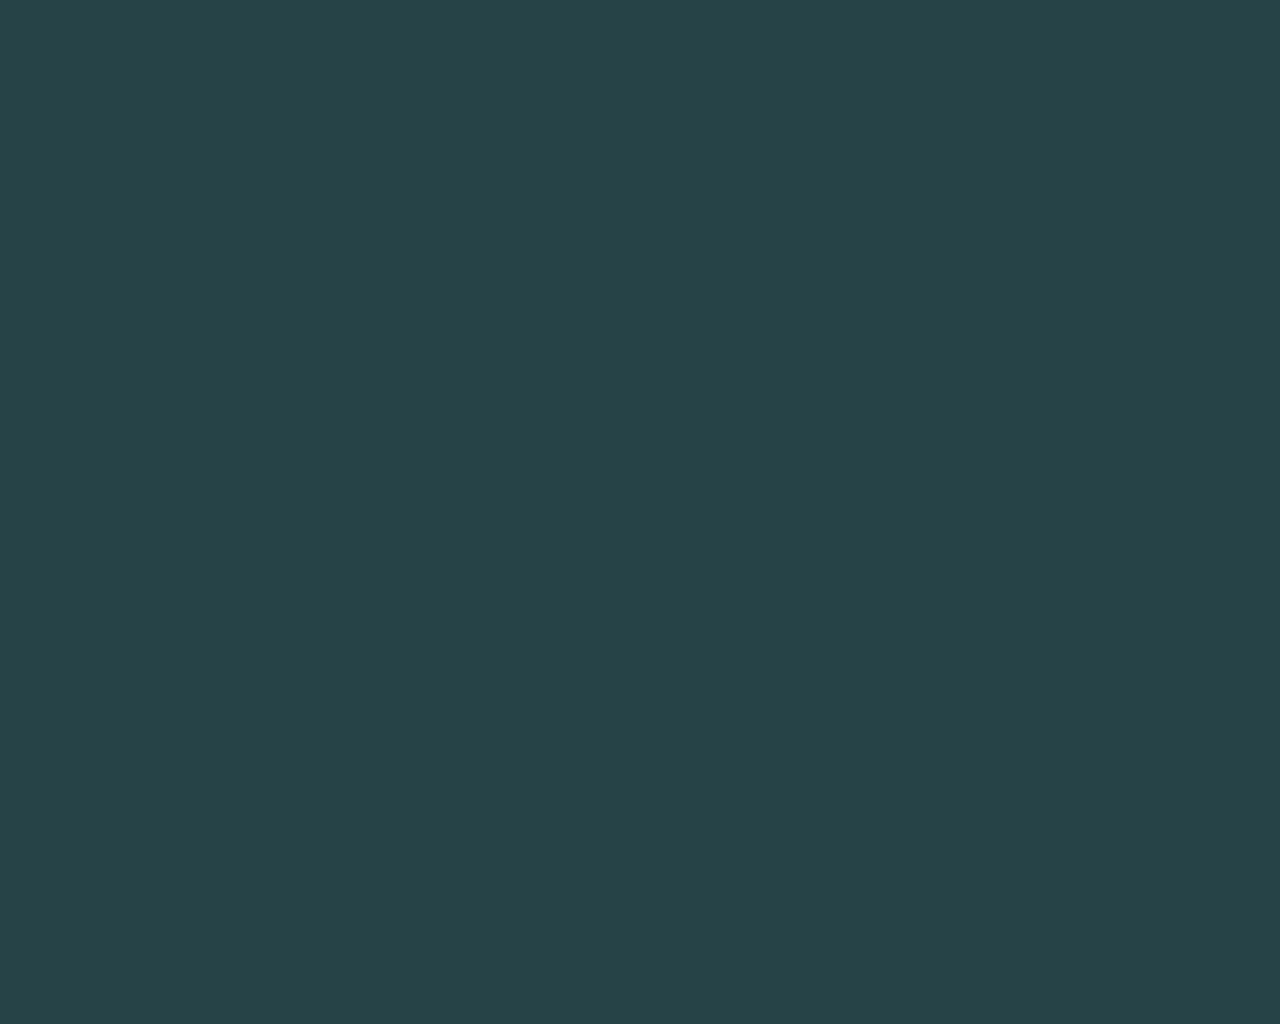 1280x1024 Japanese Indigo Solid Color Background